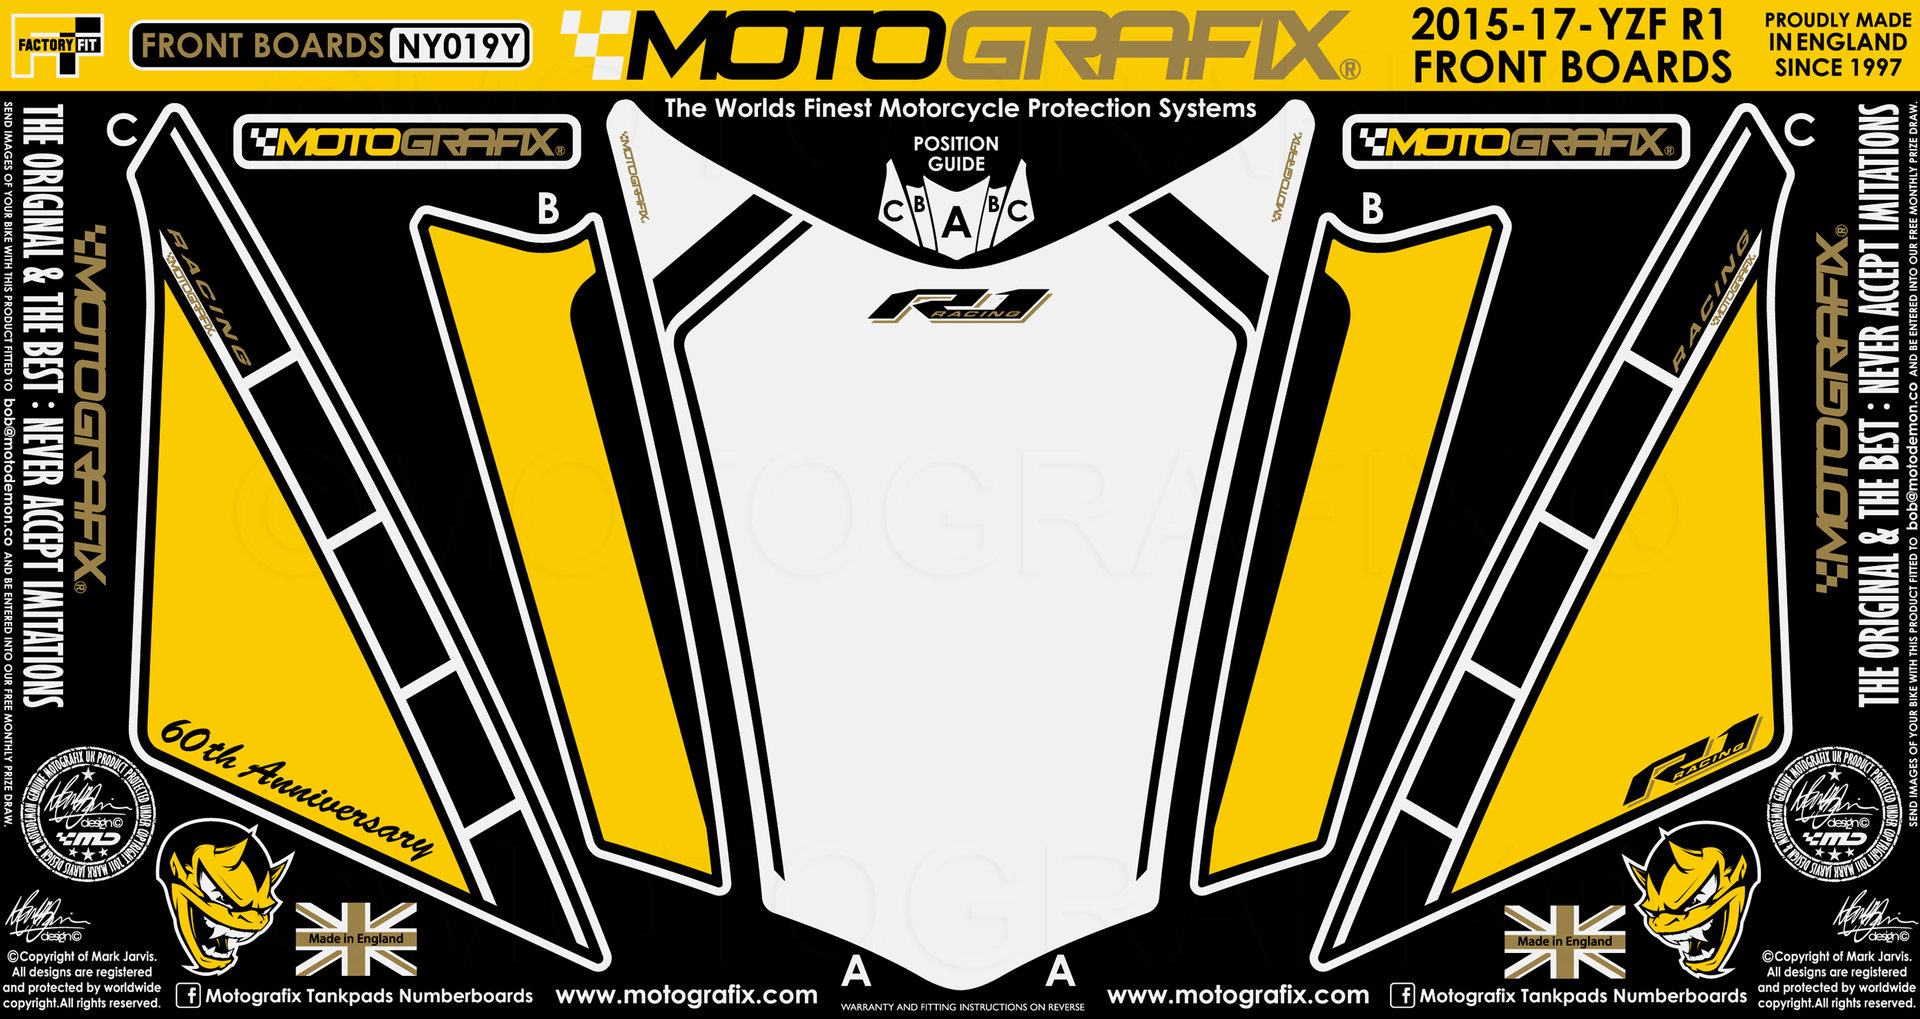 Yamaha R1 R1M 2015 16 17 Black Motorcycle Tank Pad Motografix 3D Gel Protector